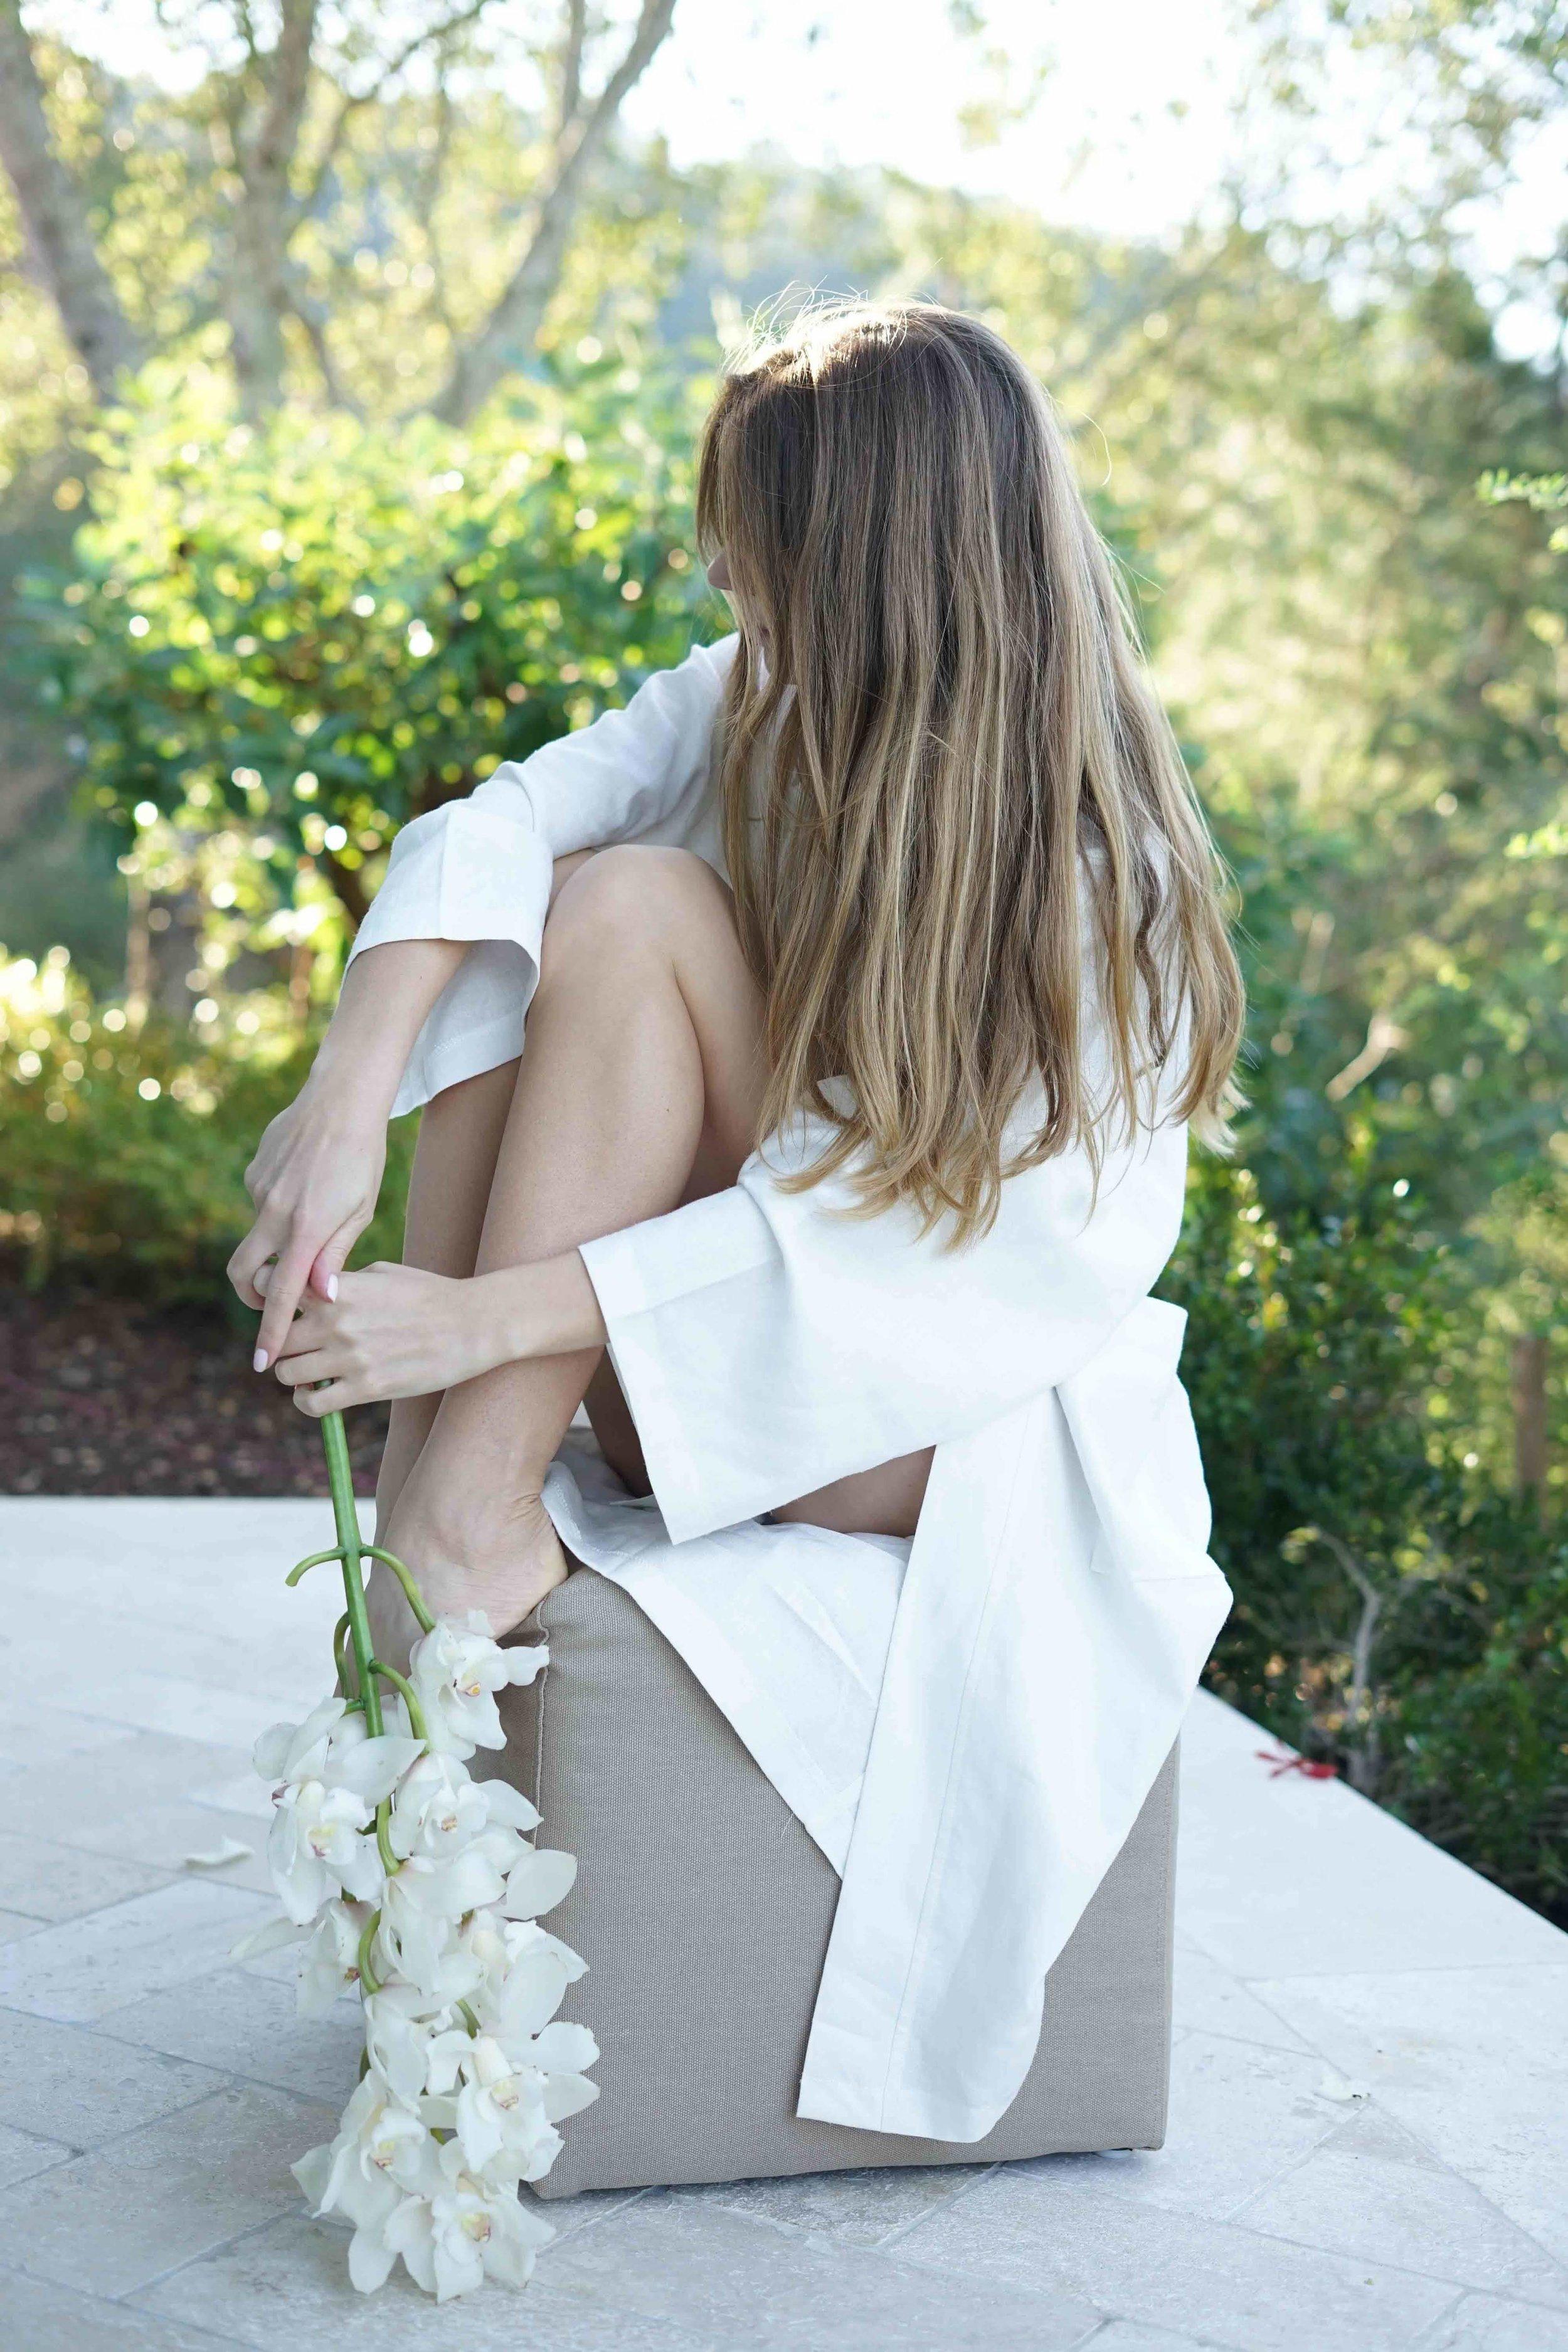 mooncloth hemp fabrics textiles eco friendly robes and kimonos made from hemp silk